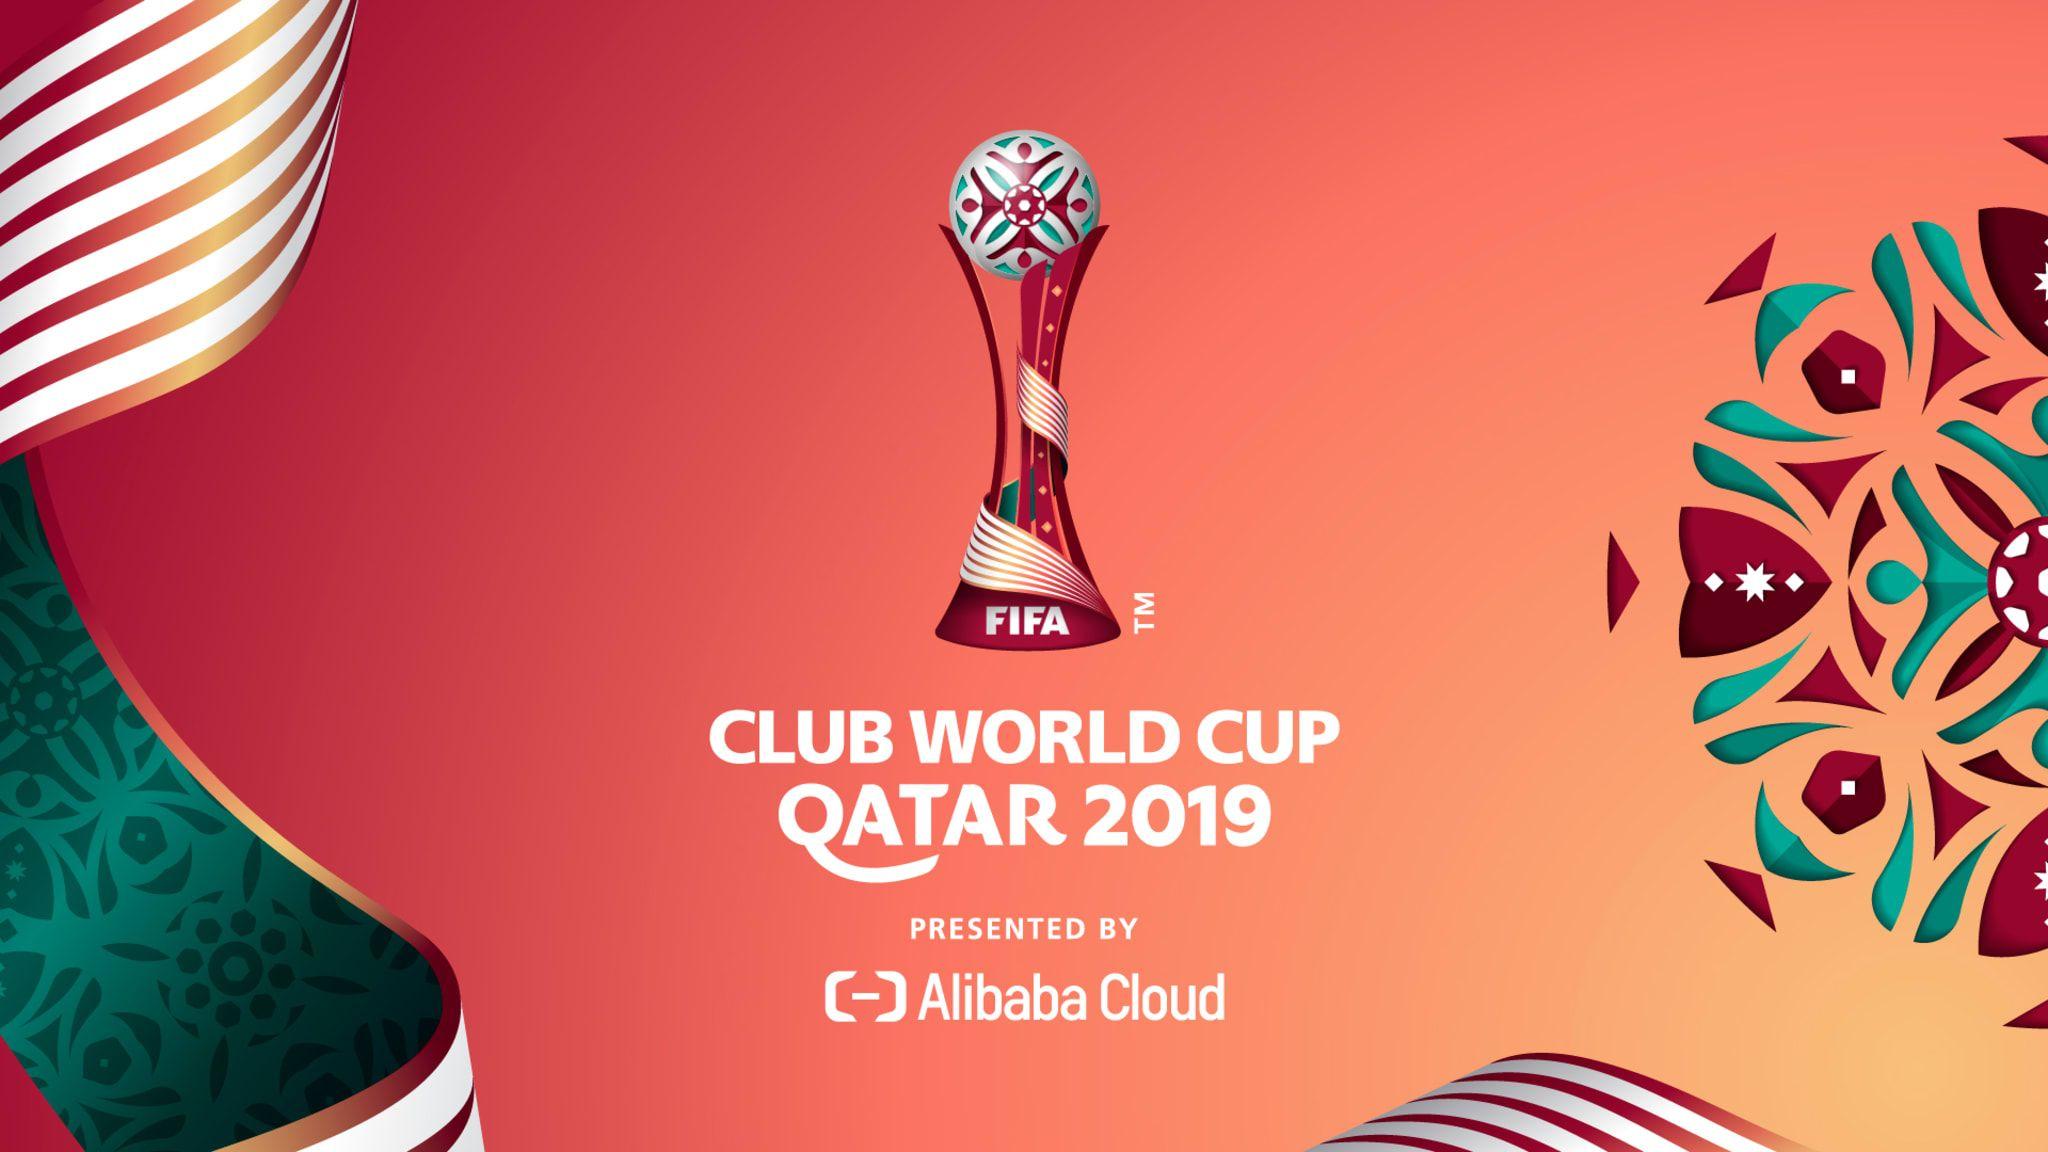 Official Emblem for FIFA Club World Cup Qatar 2019